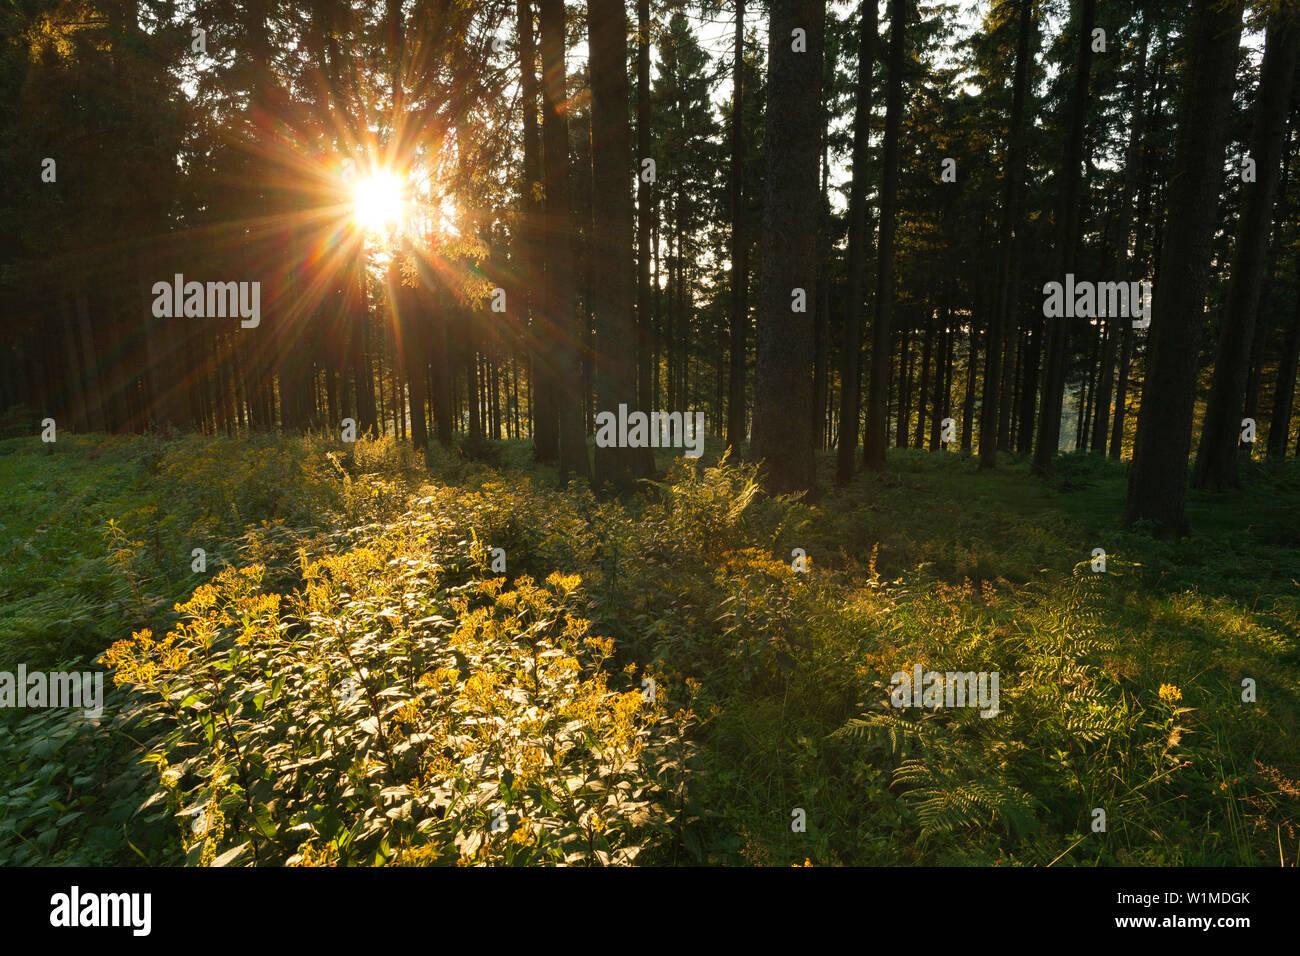 Spruce forest at Kahler Asten hill near Winterberg, Rothaarsteig hiking trail, Rothaargebirge, Sauerland region, North Rhine-Westphalia, Germany - Stock Image